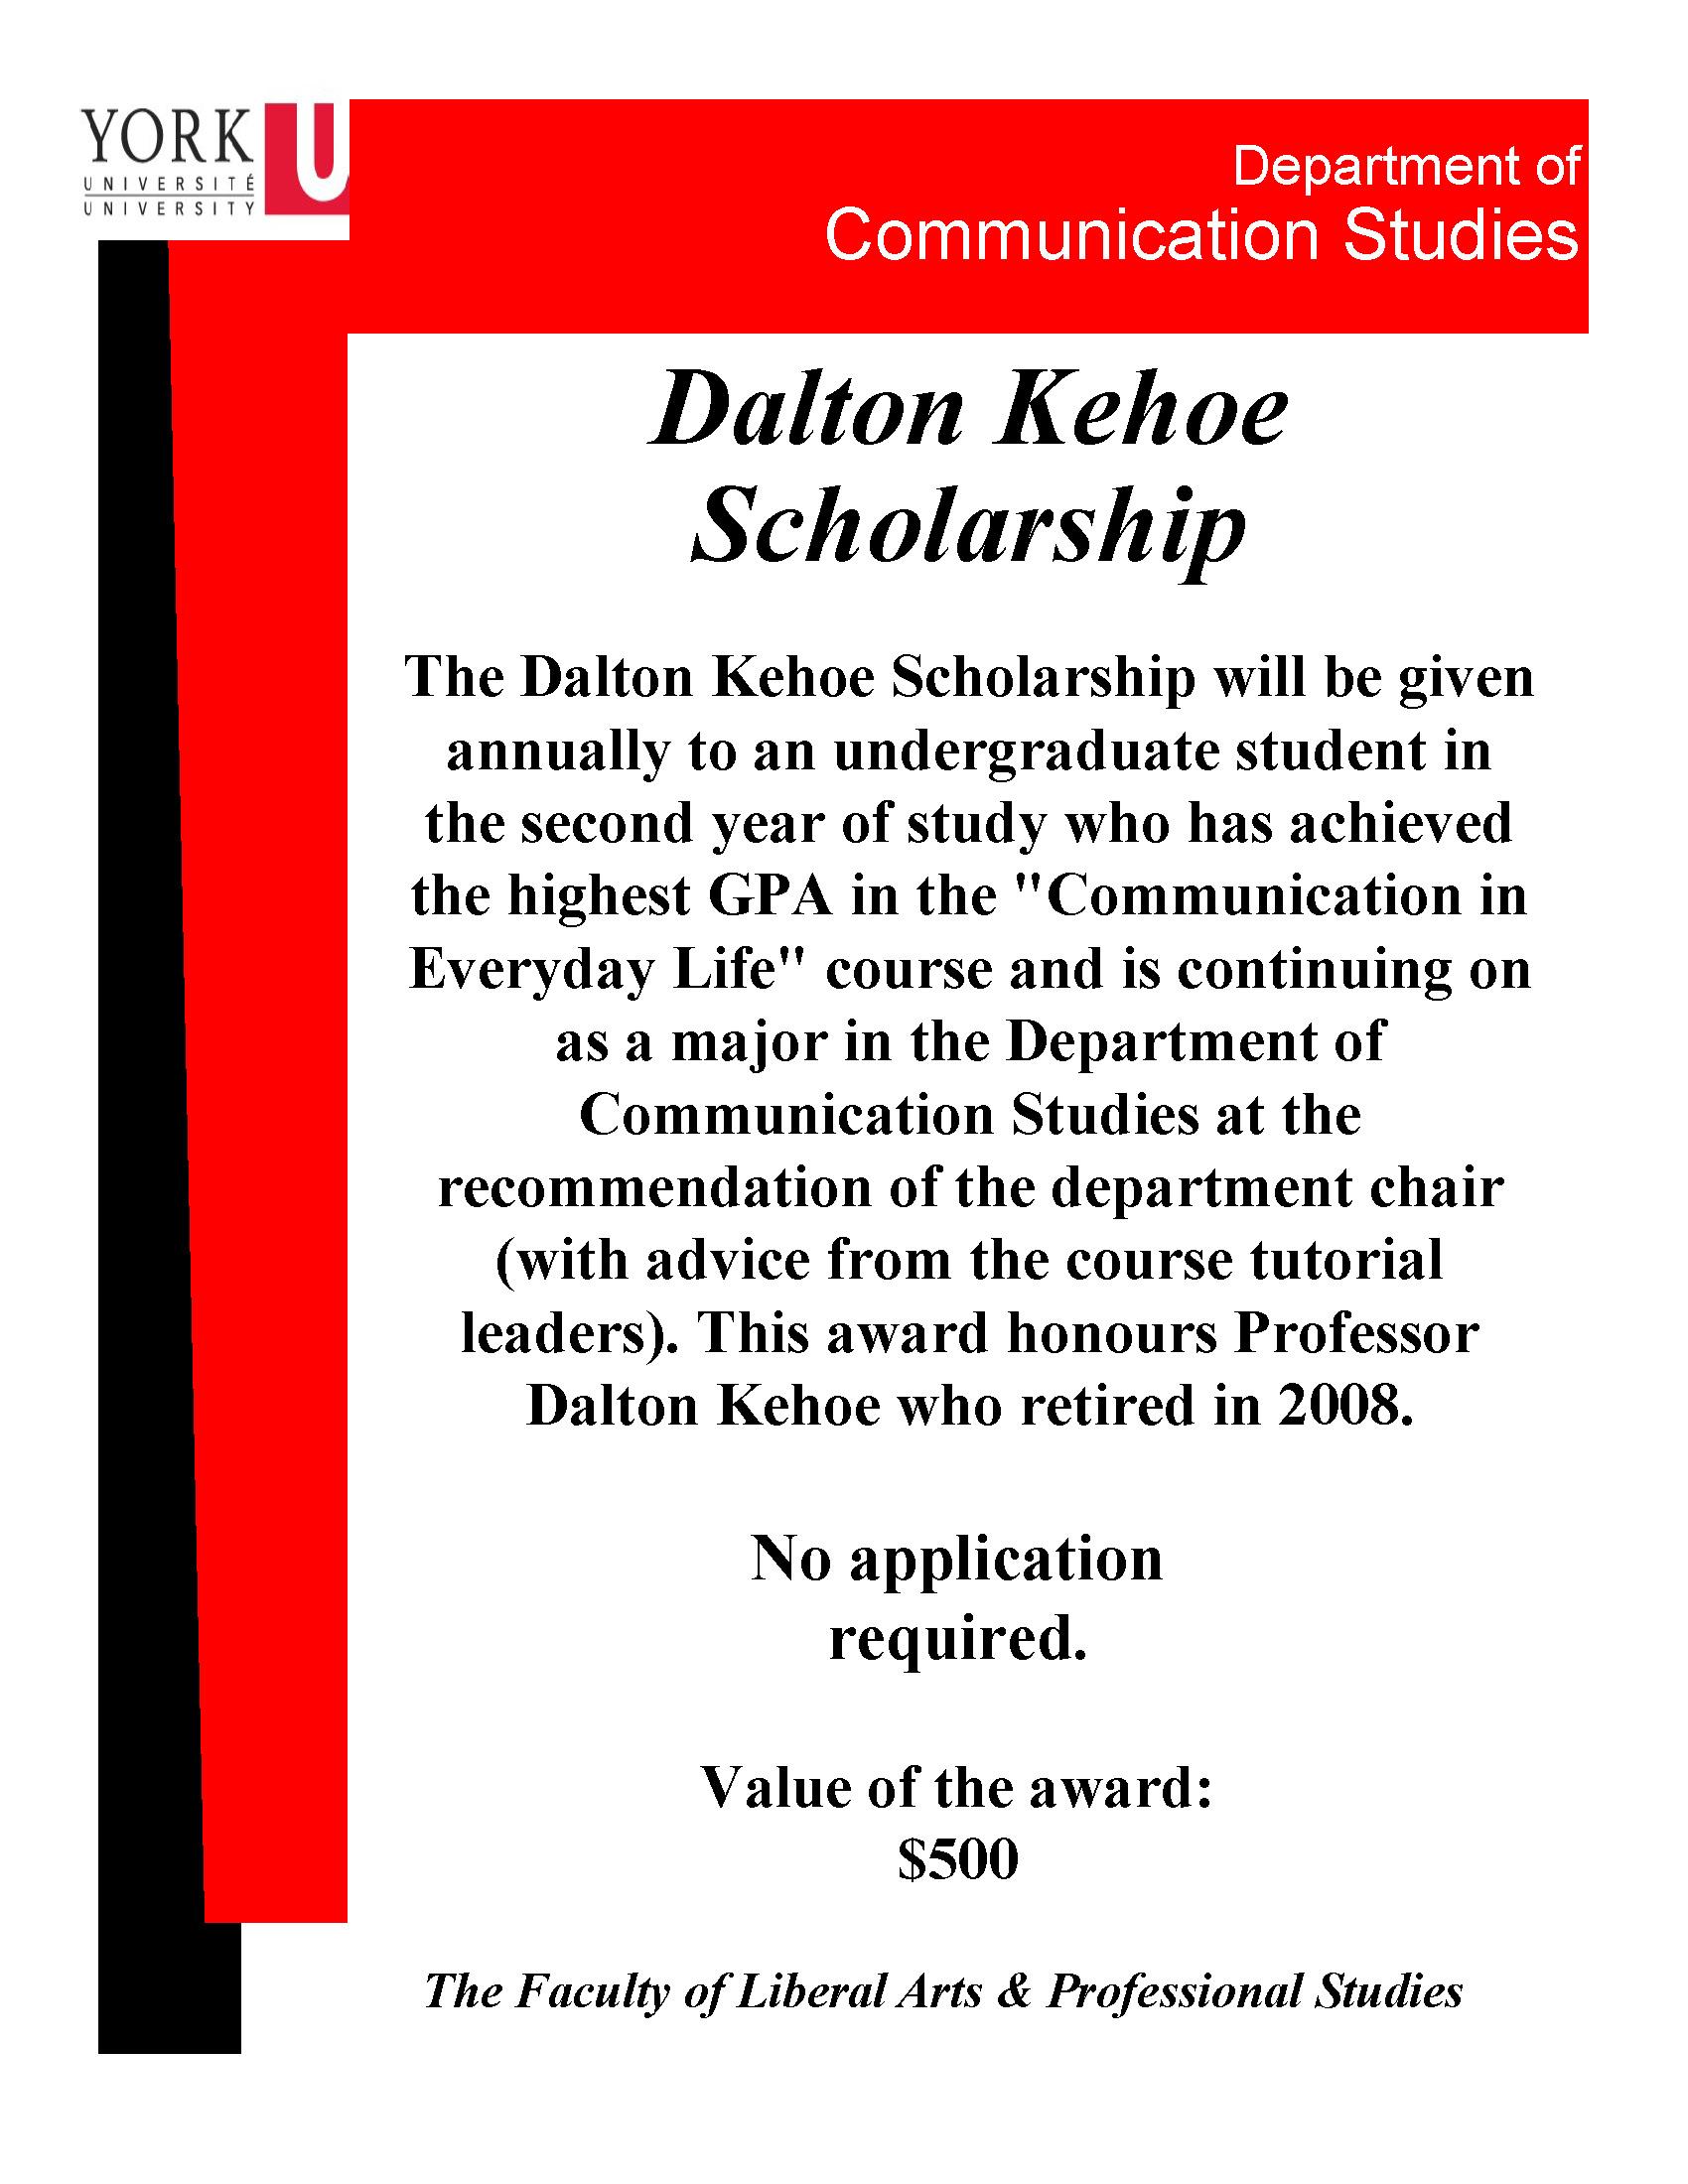 Dalton Kehoe Scholarship